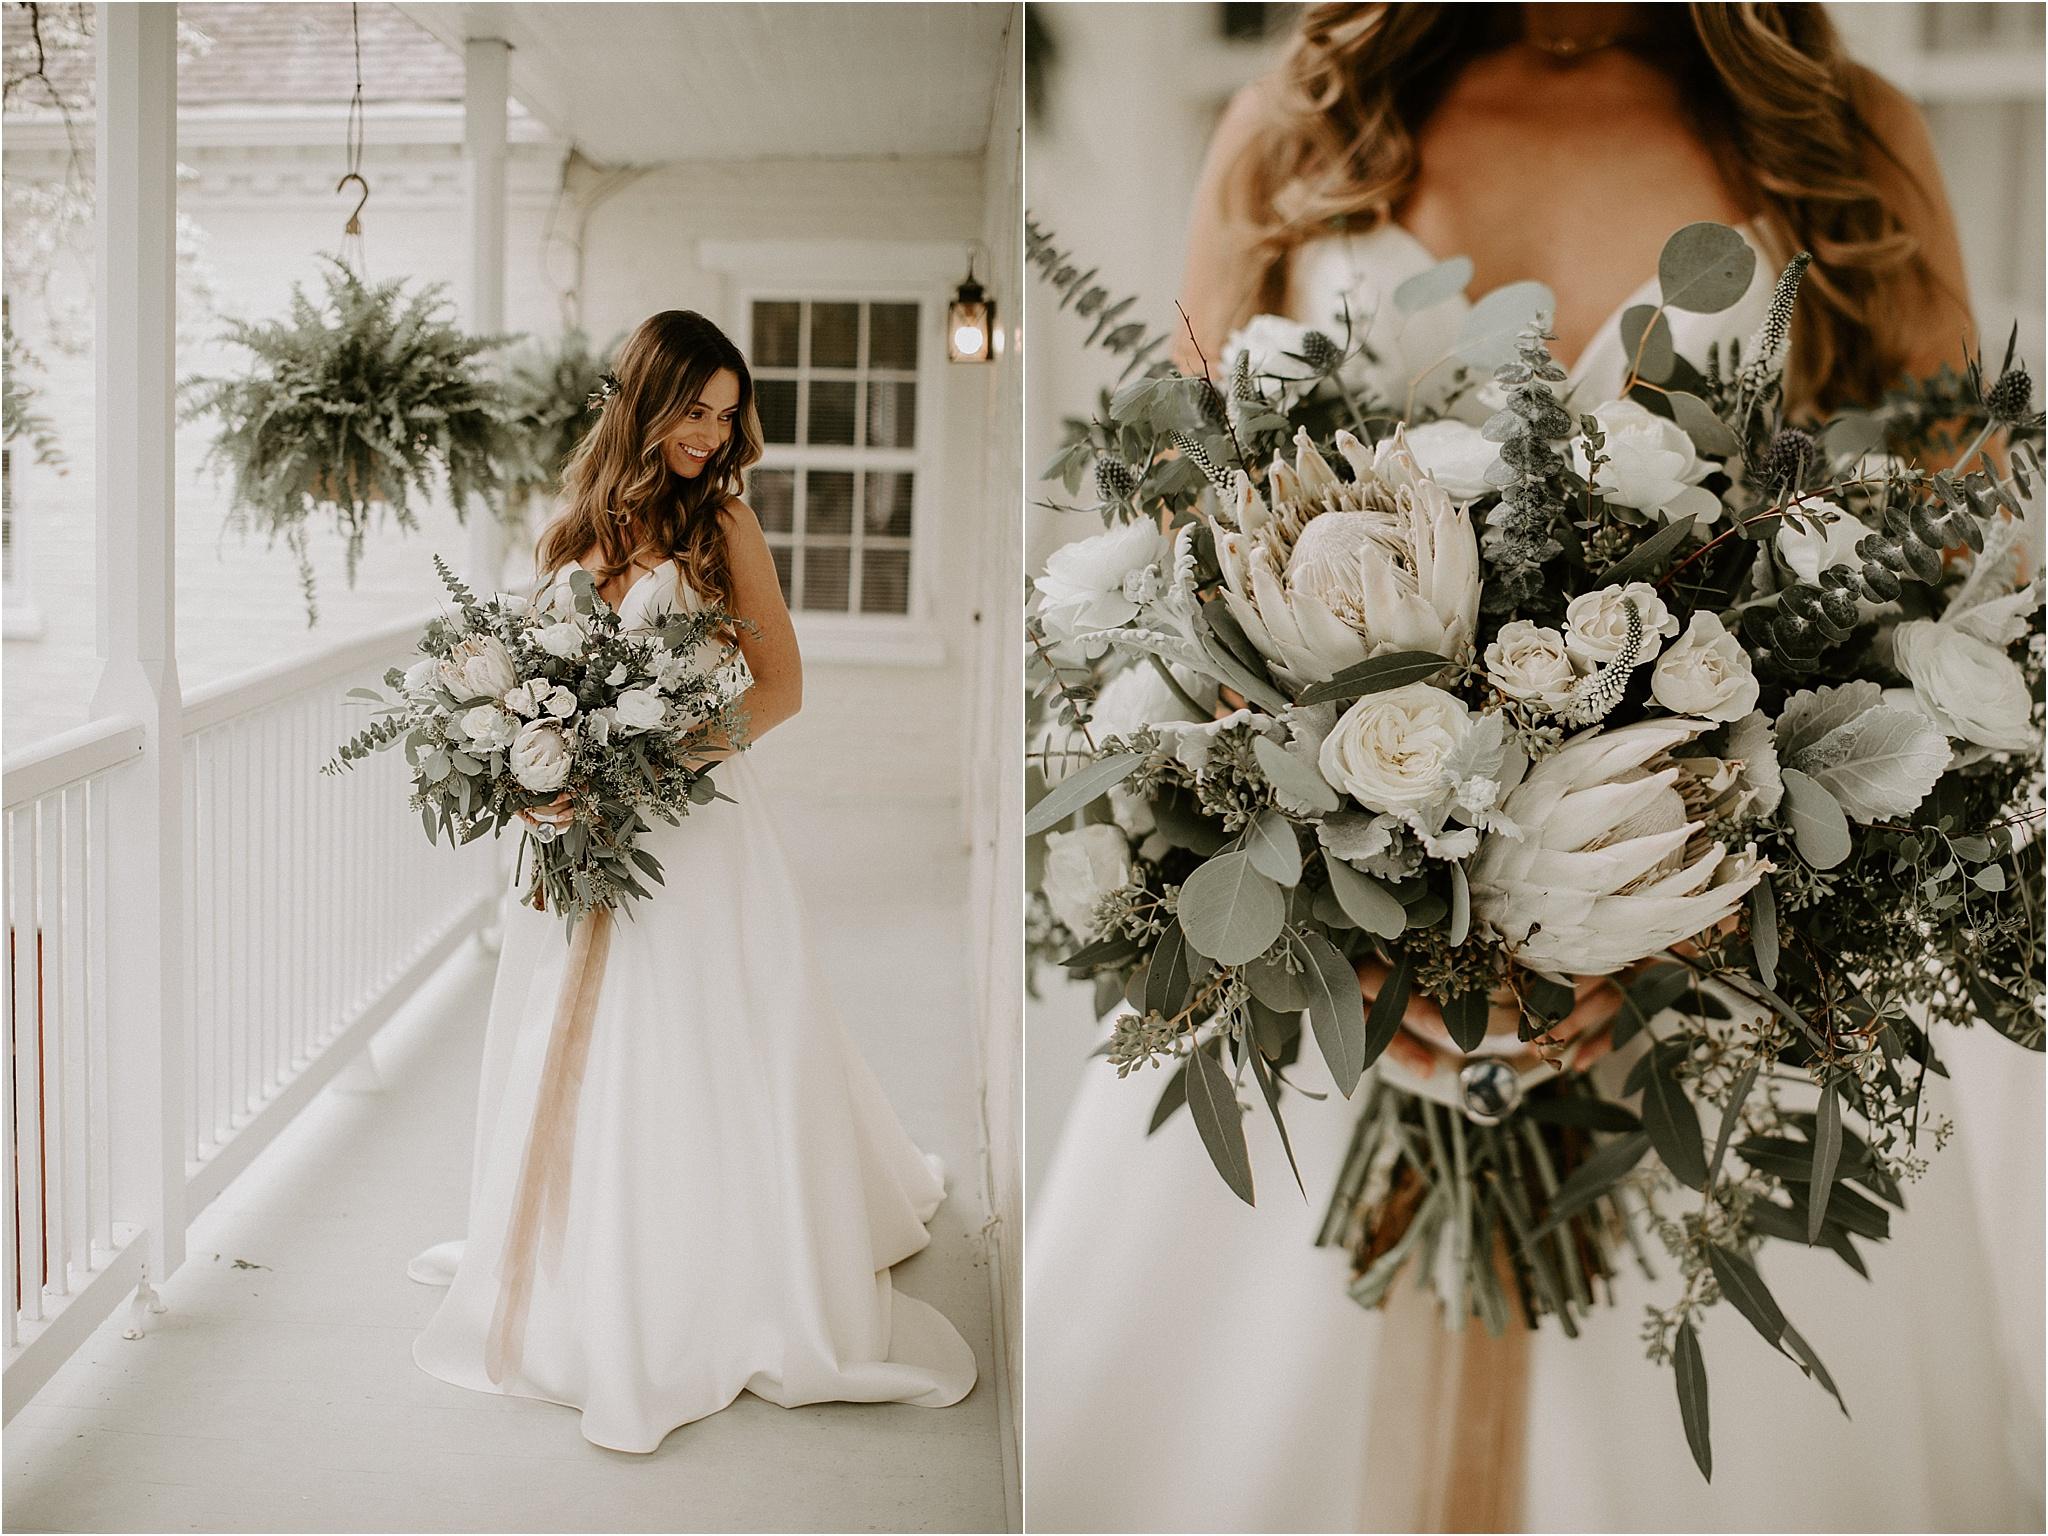 Sarah_Brookhart_Lancaster_PA_Wedding_Photographer_0015.jpg